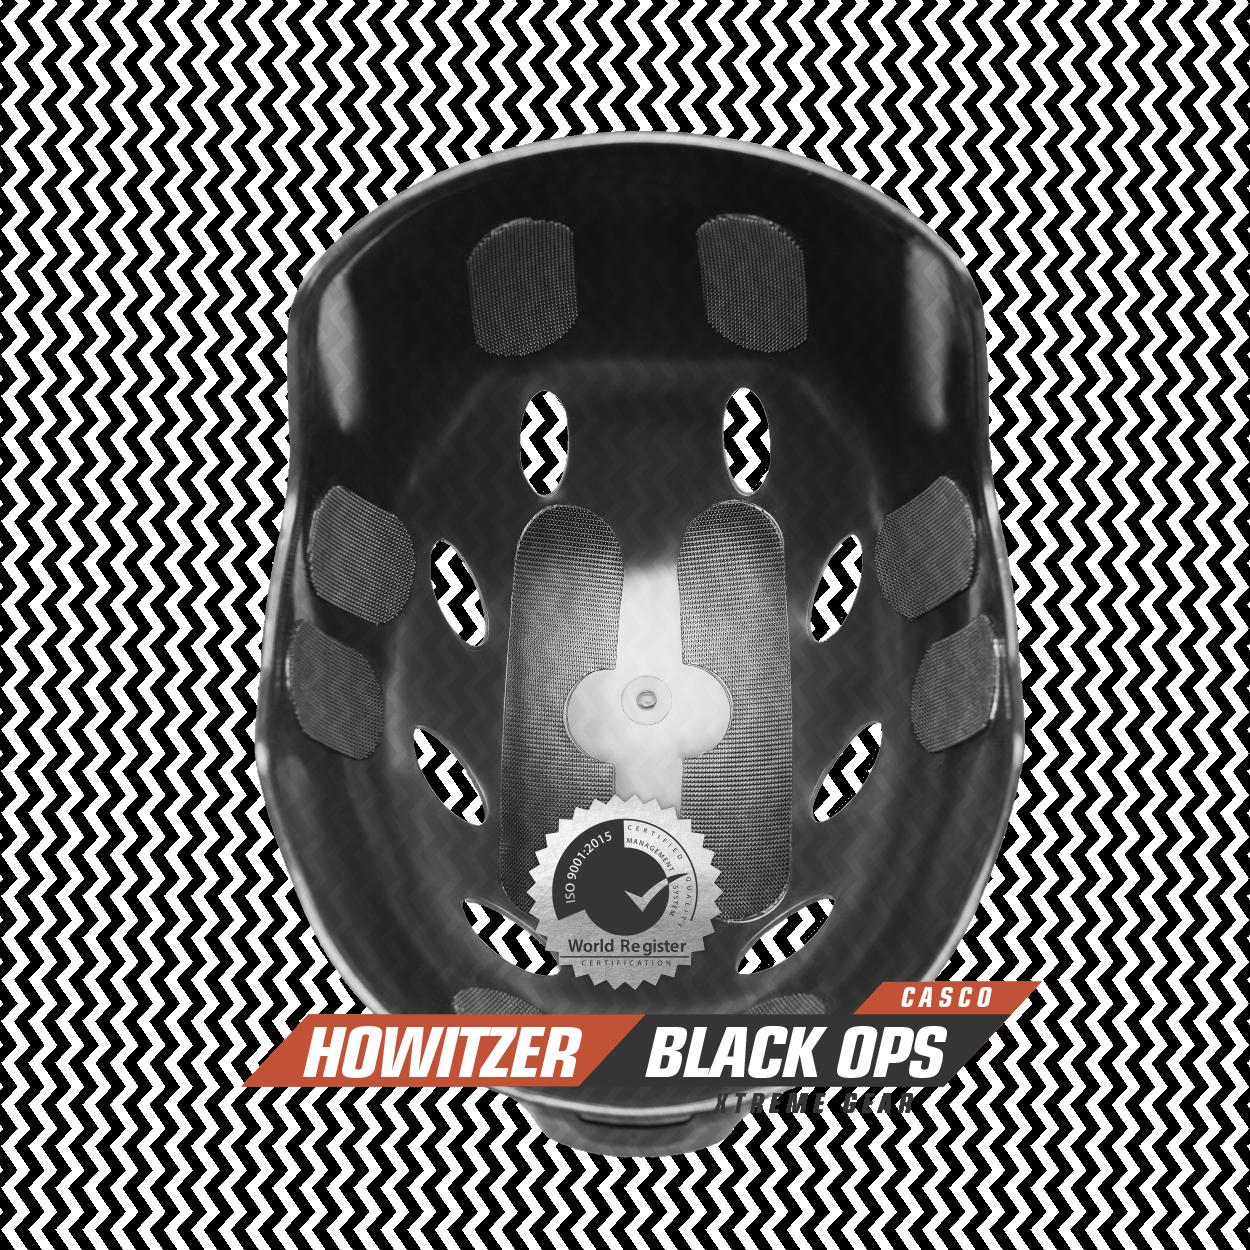 Casco Howitzer Black-Ops Arvak Tactical